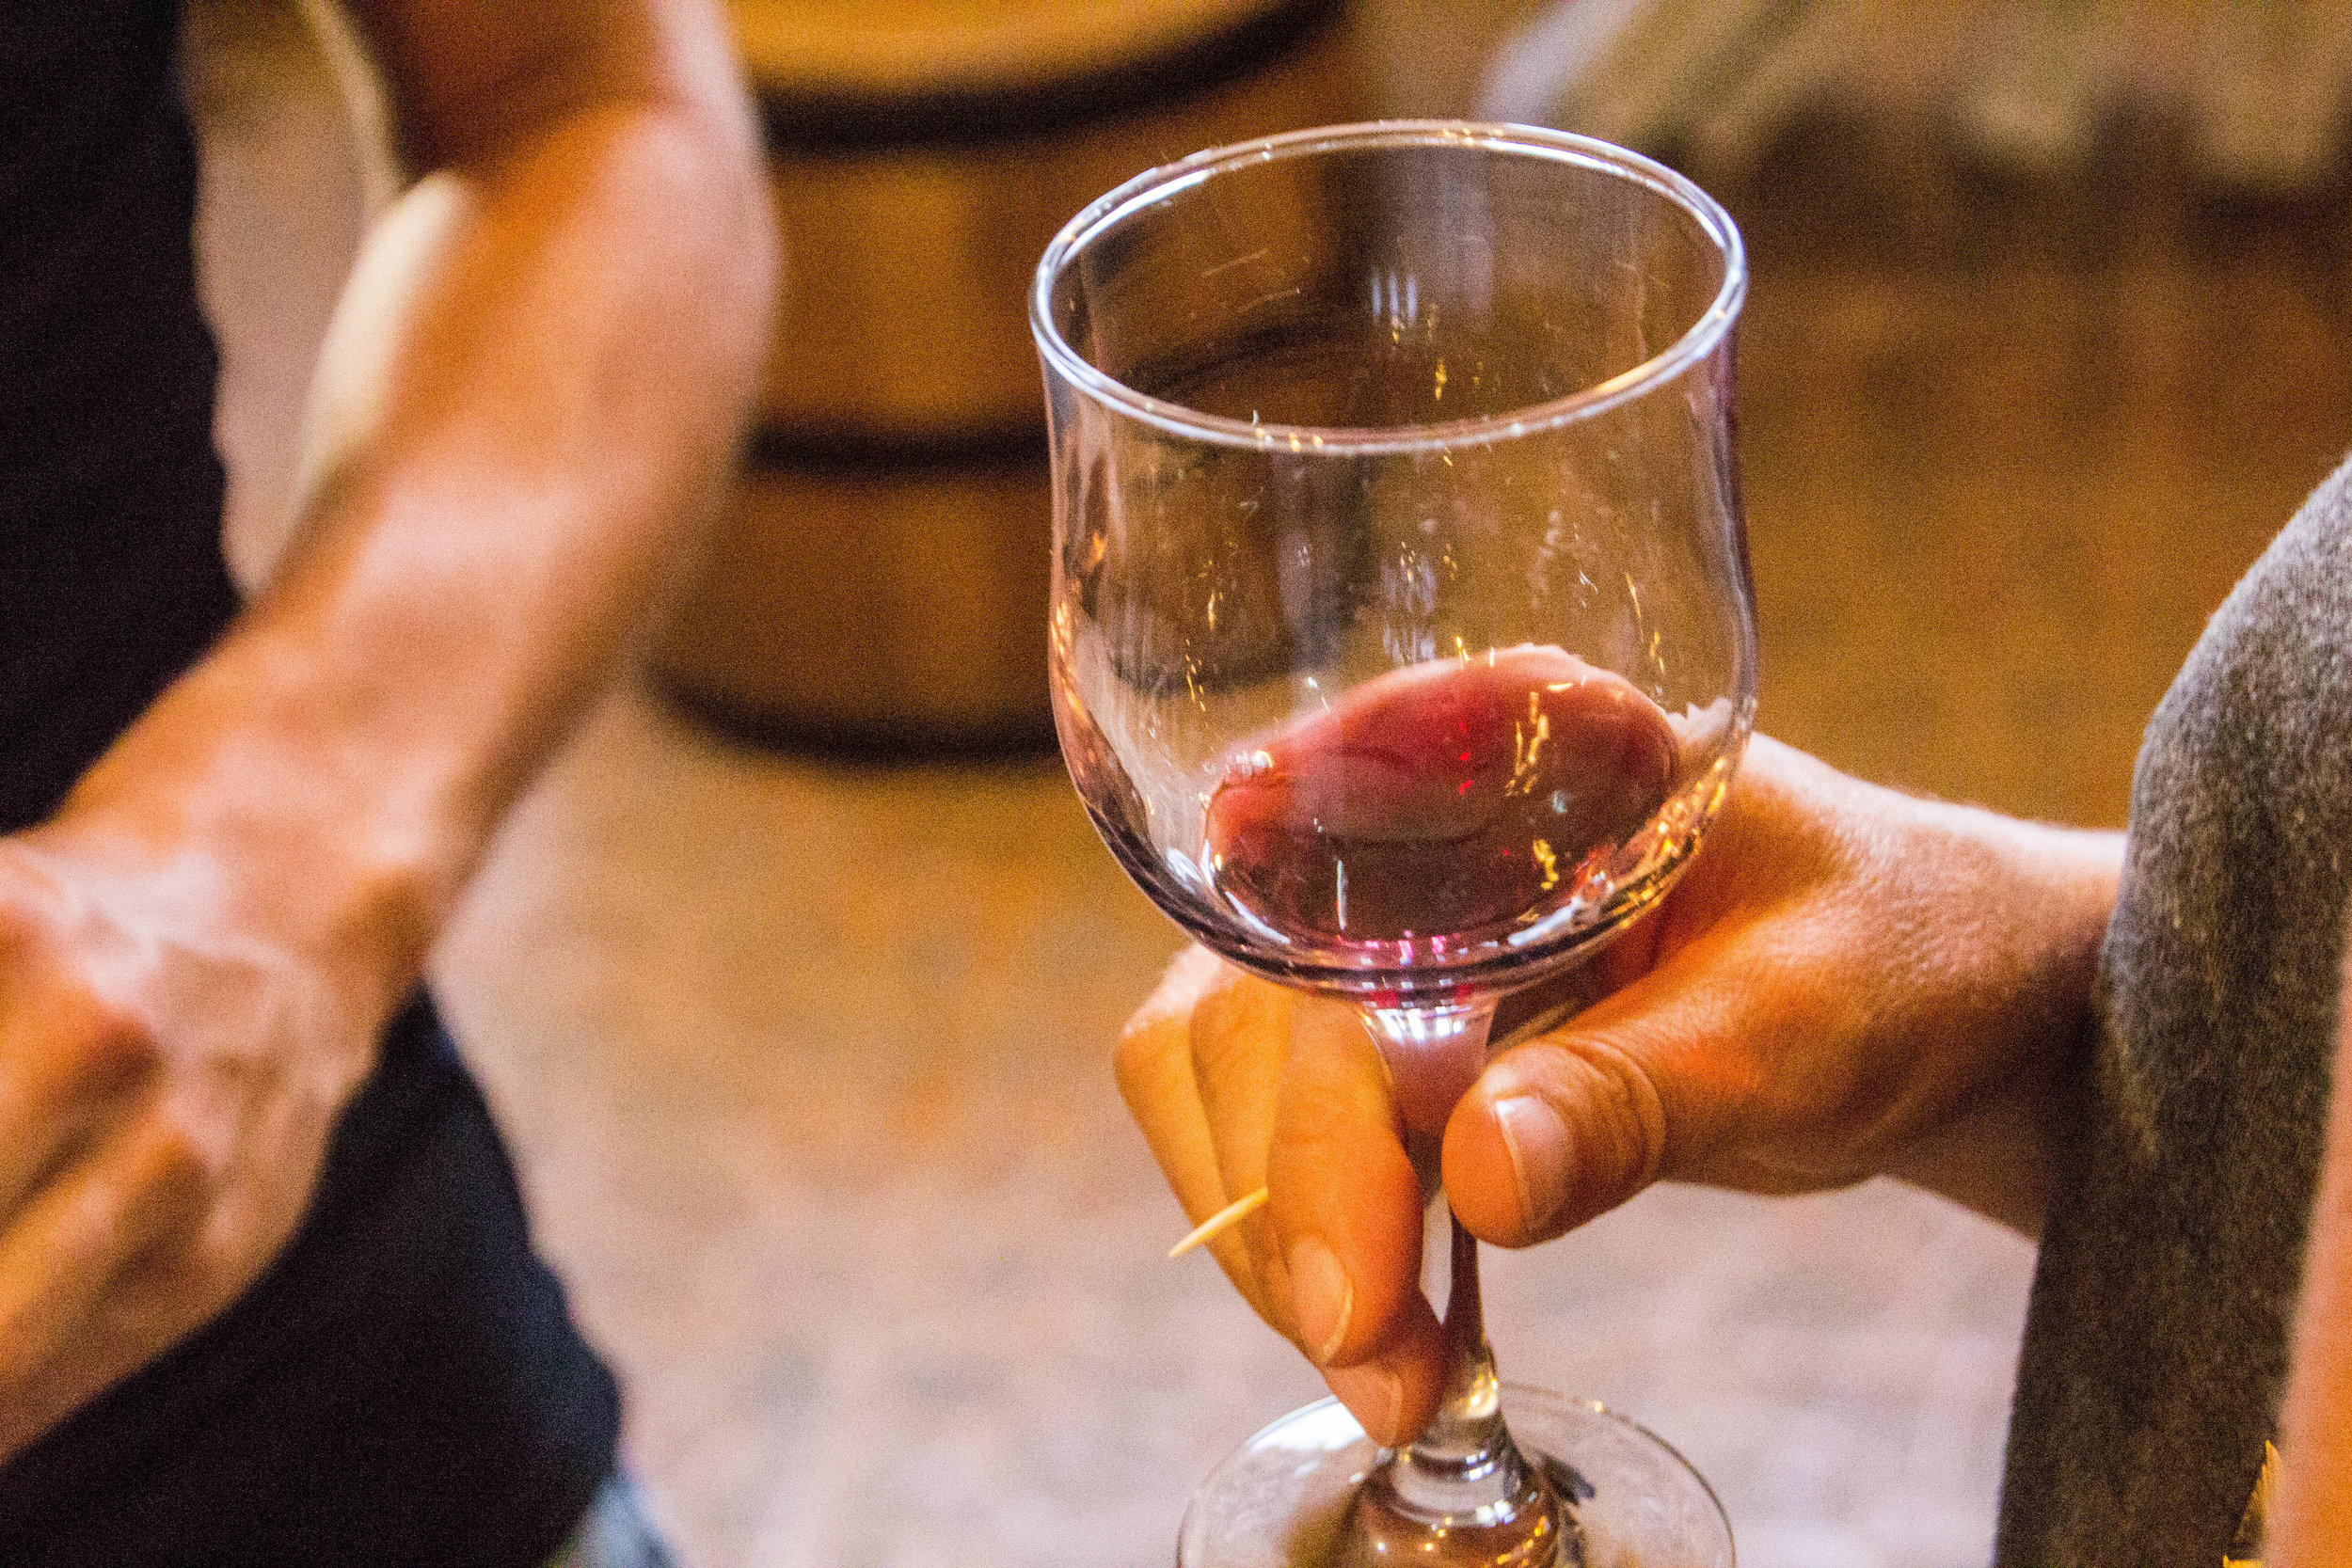 armenian-wine-tasting-5.jpg